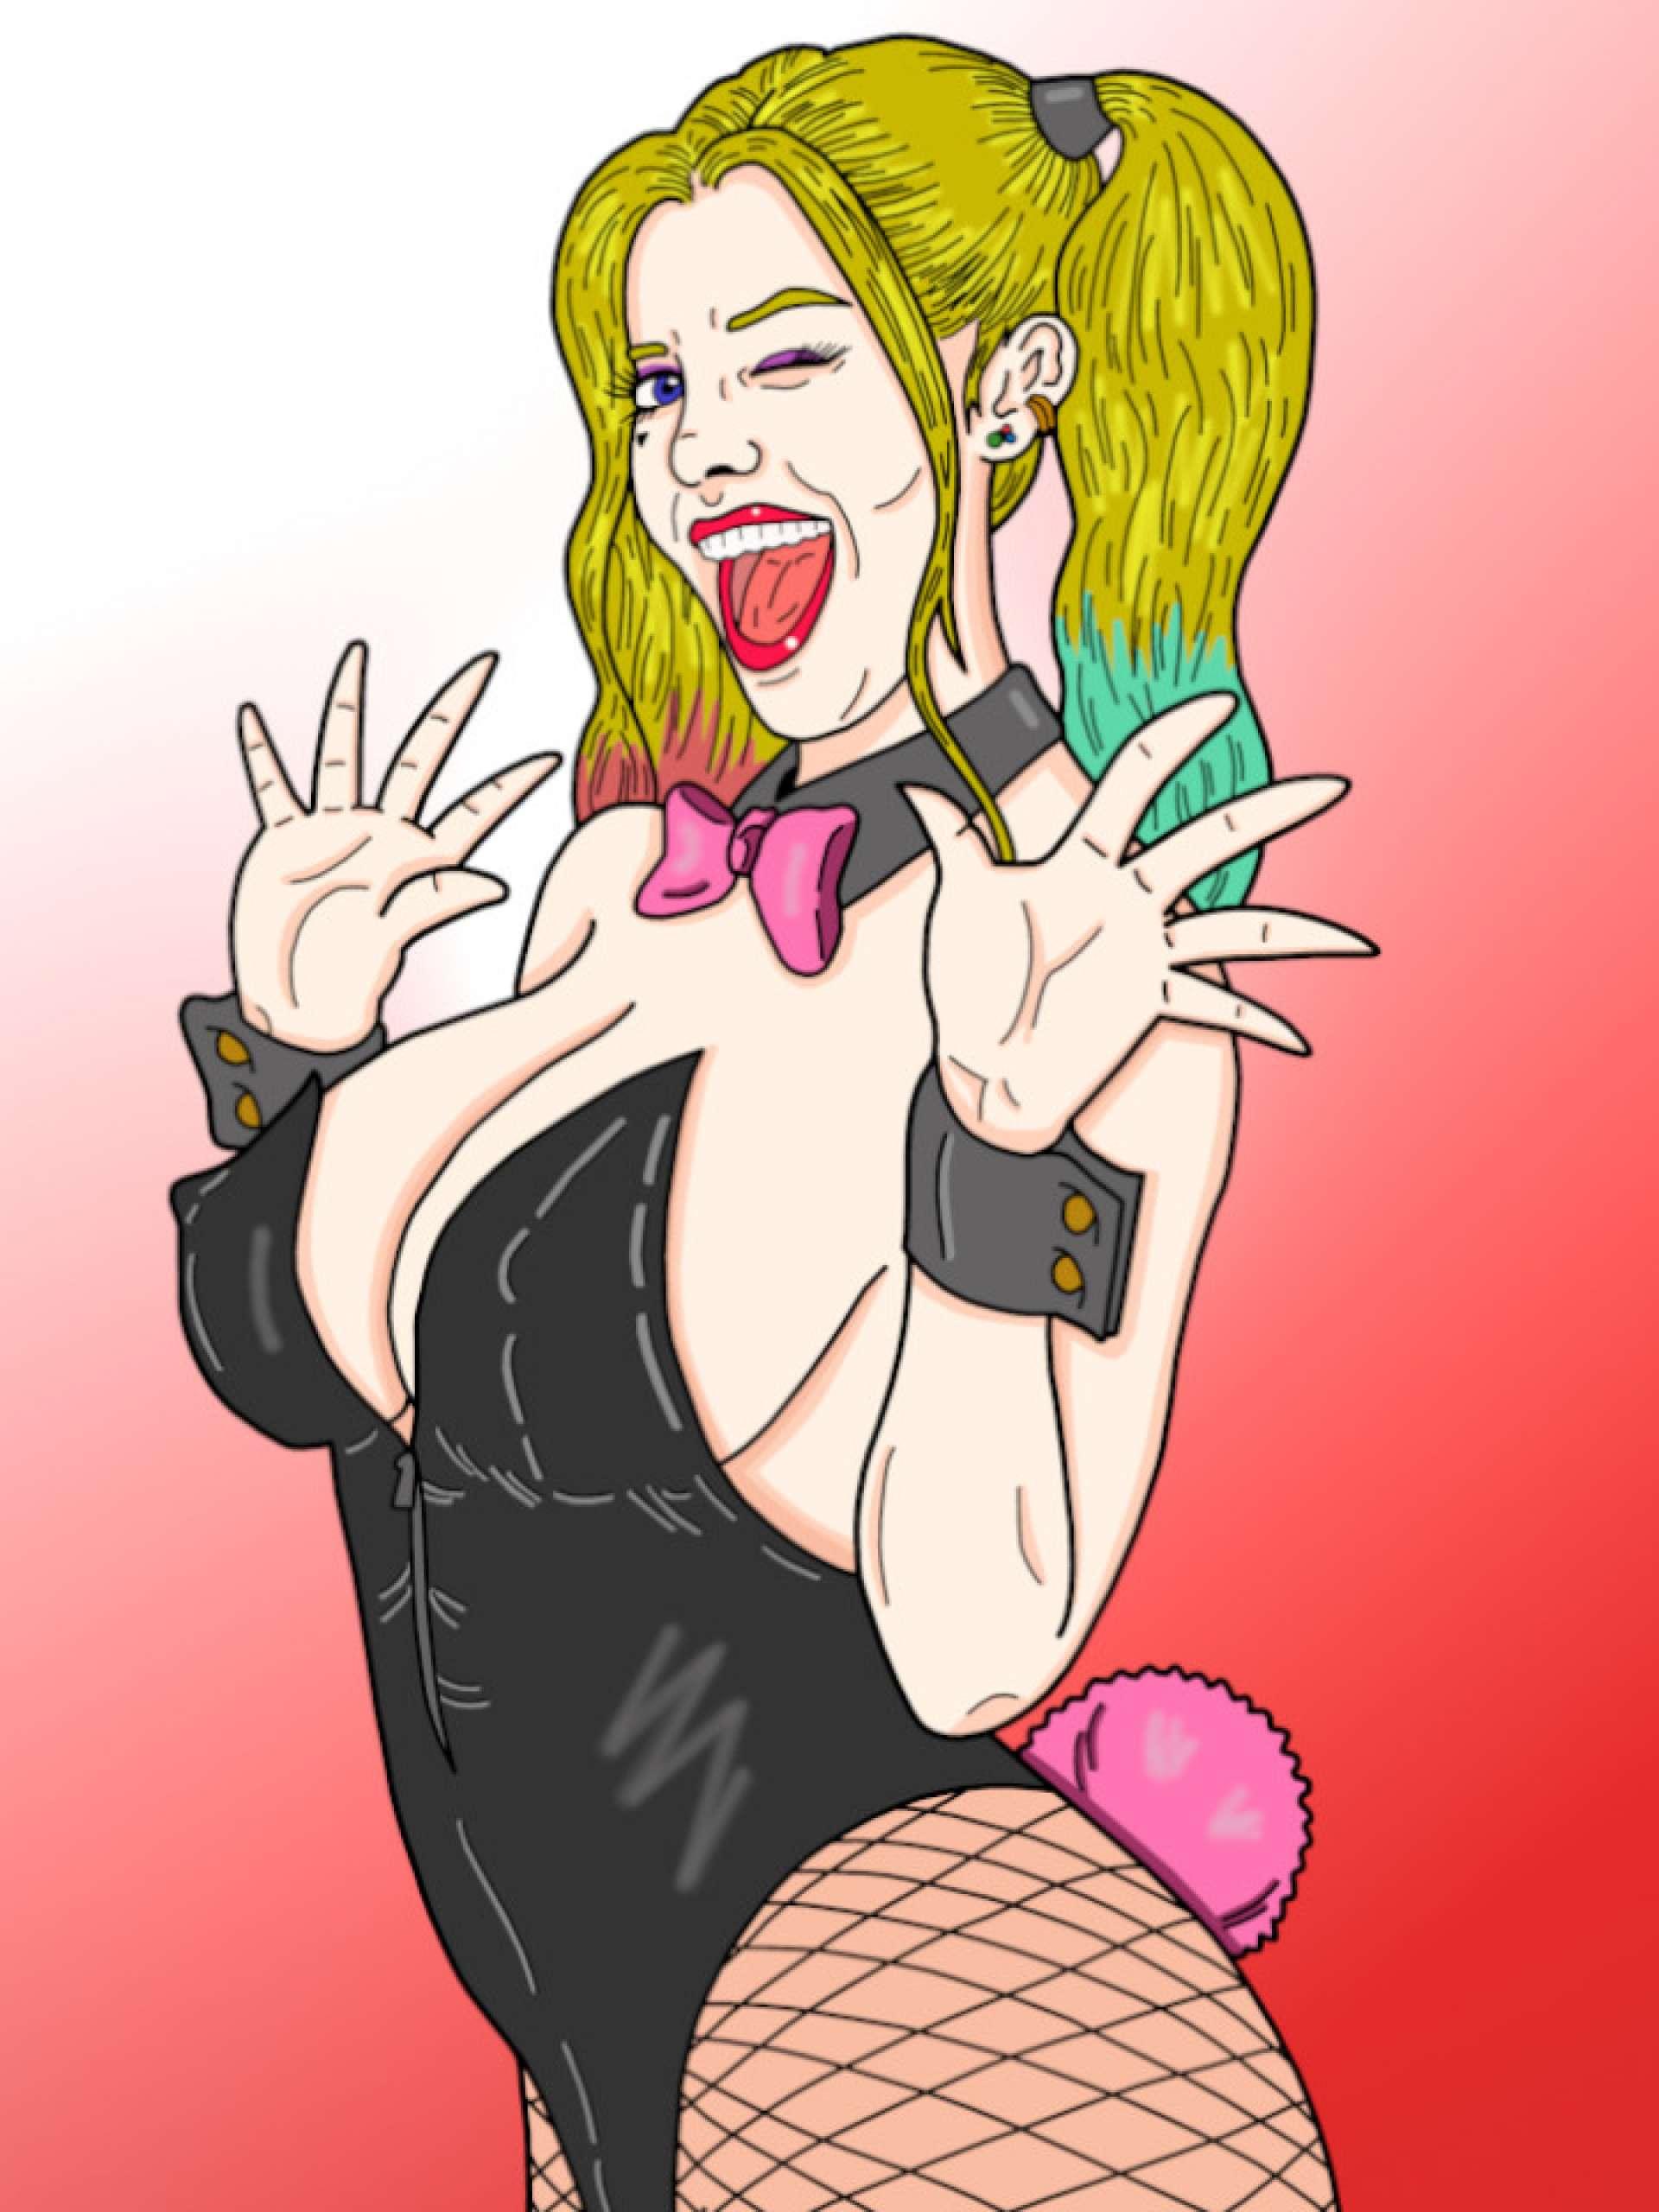 AlexOkami Artist Illustrator PinUp Nude Fetish ASN Lifestyle Magazine